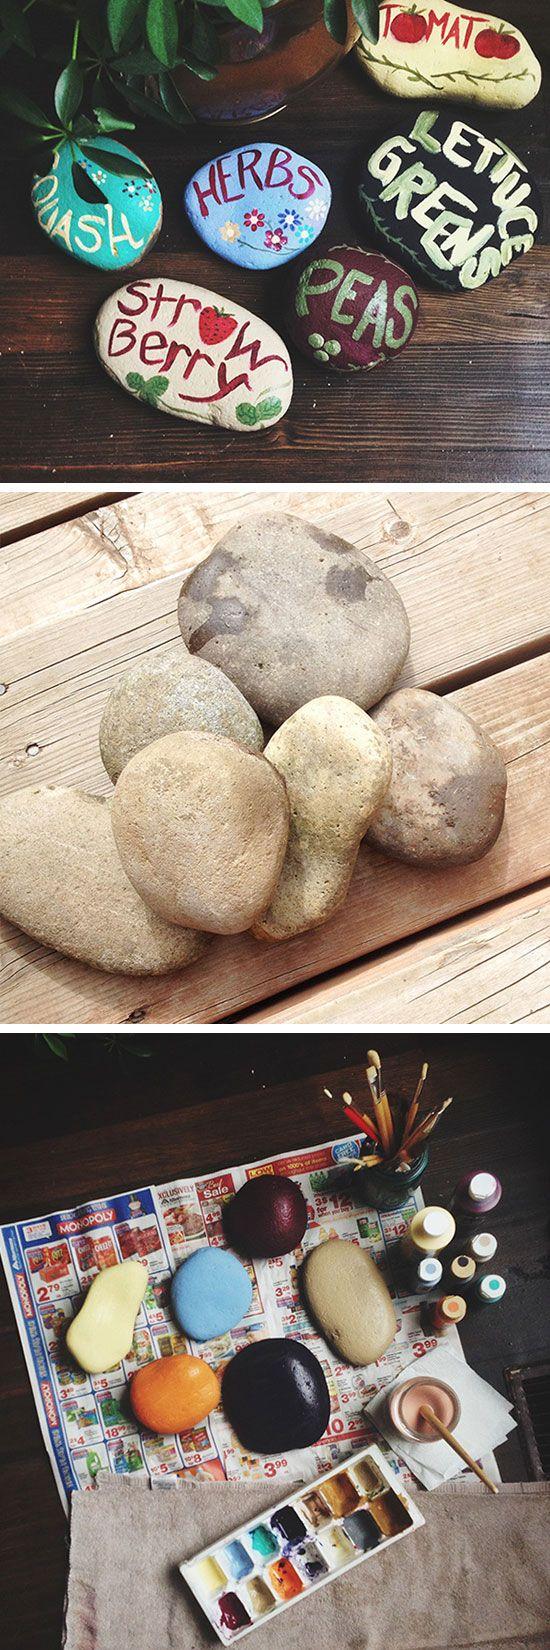 DIY Painted Garden Rocks | Click Pic for 20 DIY Garden Ideas on a Budget | DIY Backyard Ideas on a Budget for Kids